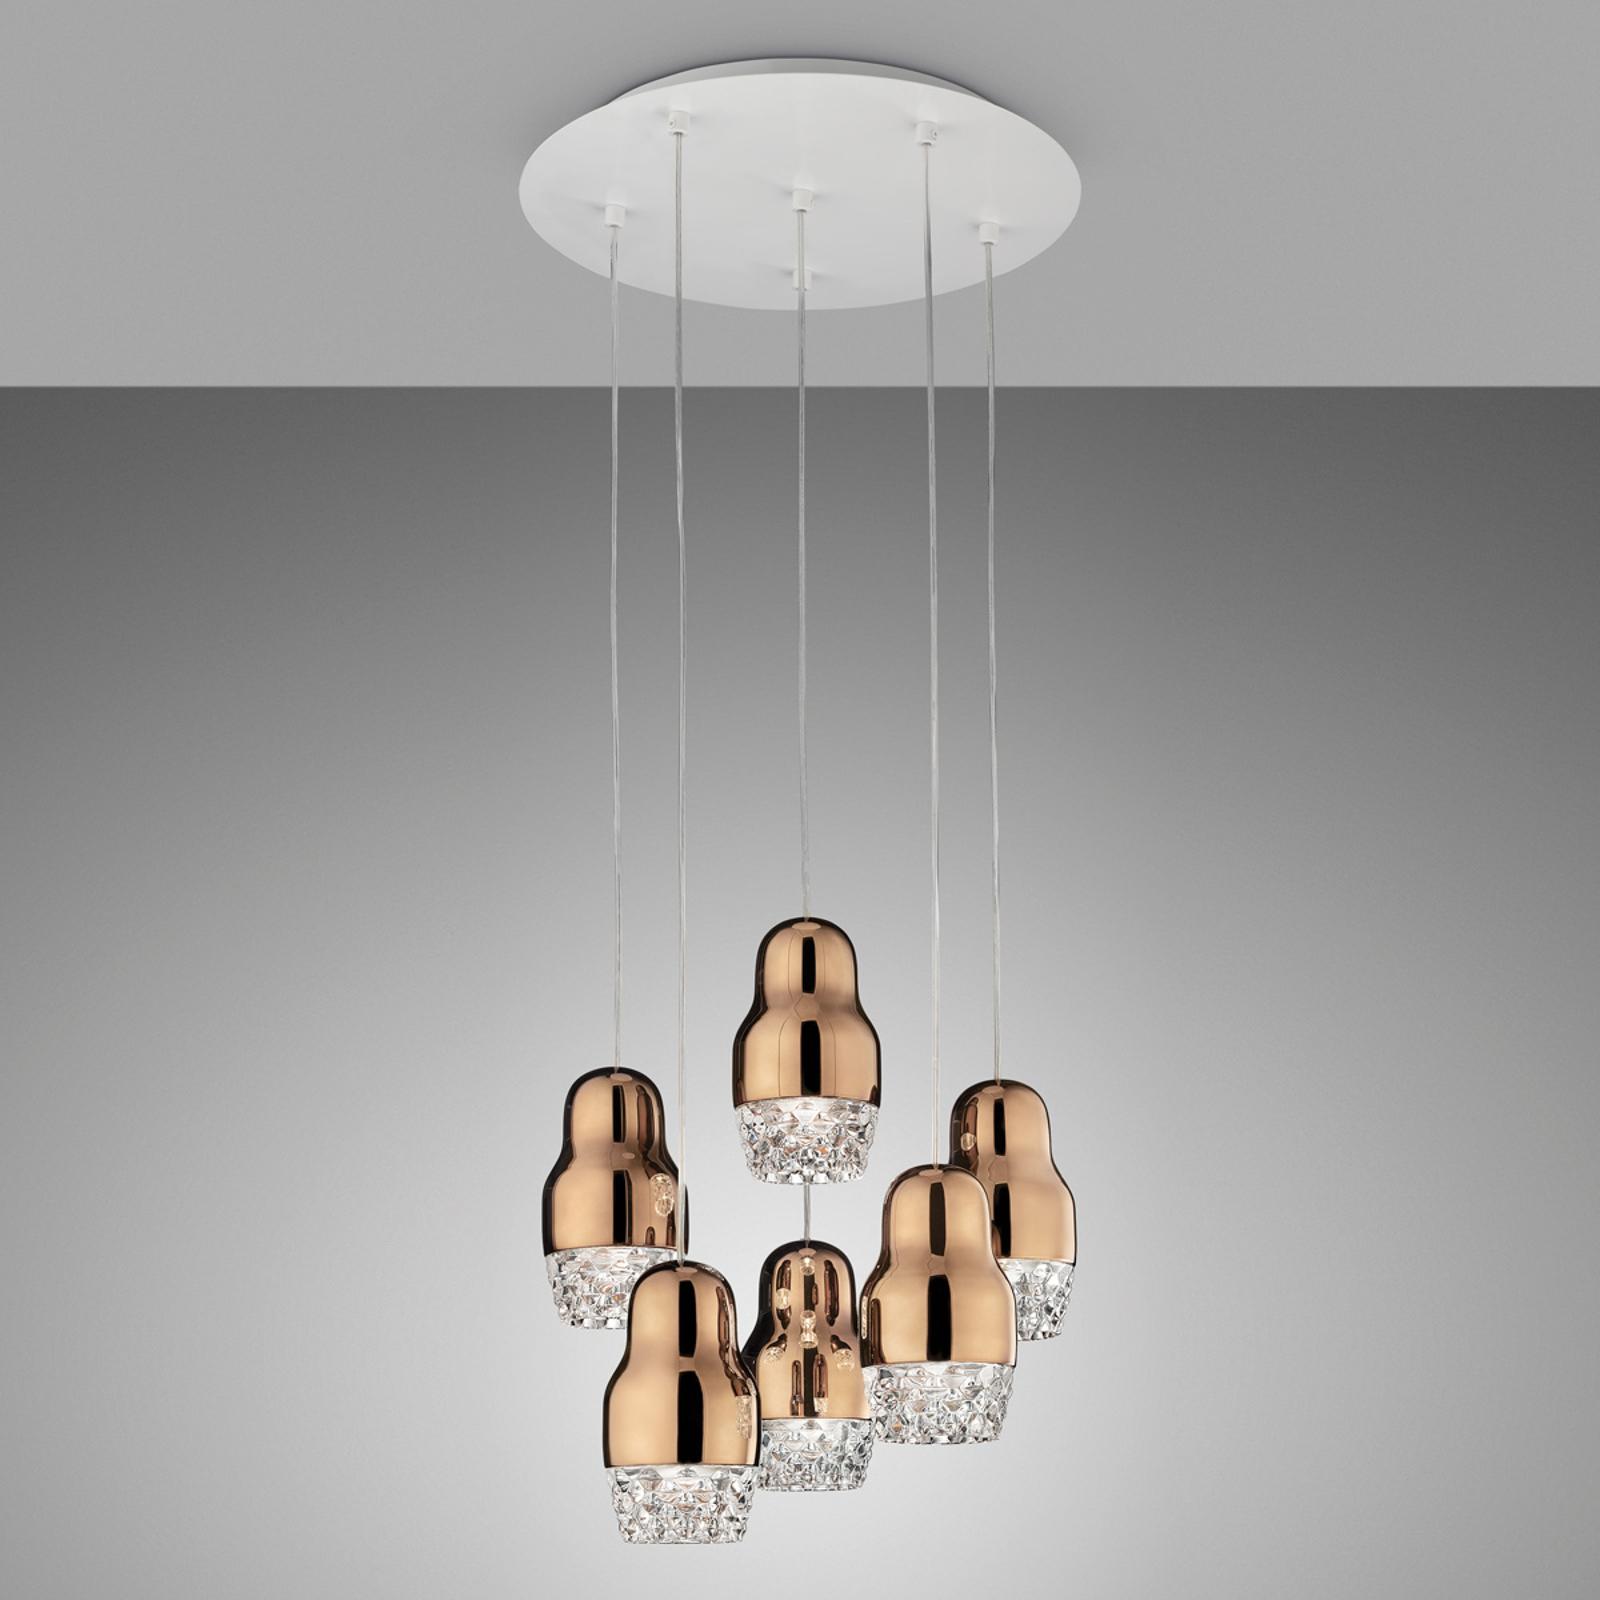 Lampada a sospensione LED Fedora 6 luci oro rosato